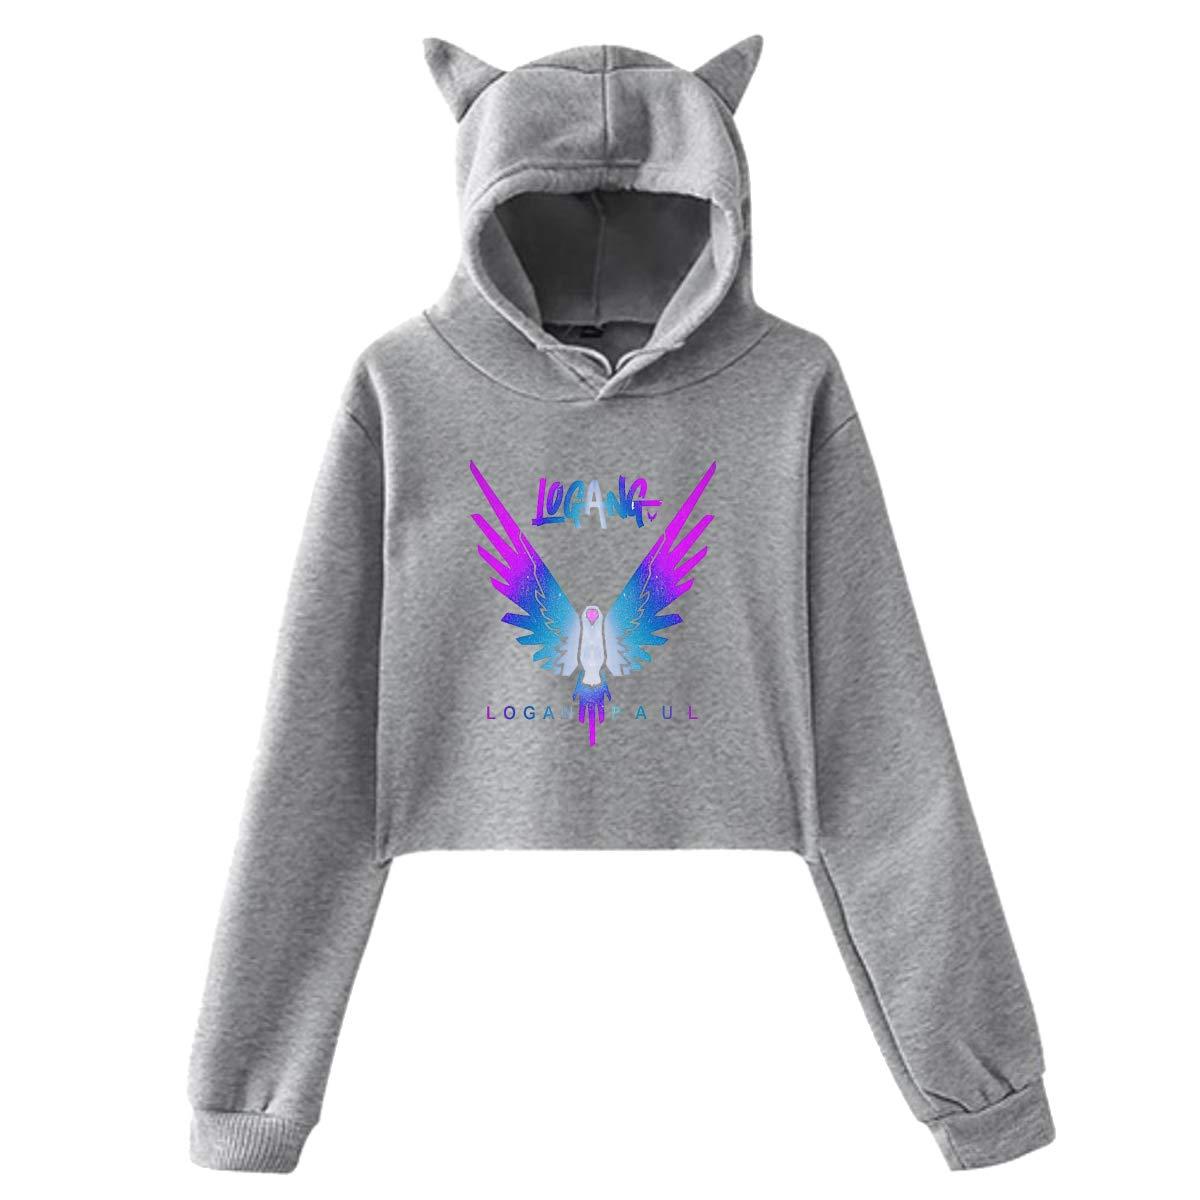 Youth Girls Hoodie Jake Paul Logang Logan Paul Maverick Cat Ear Sweatershirt Long Sleeve Crop Top Hoodies for Girls Gray M by BKashy